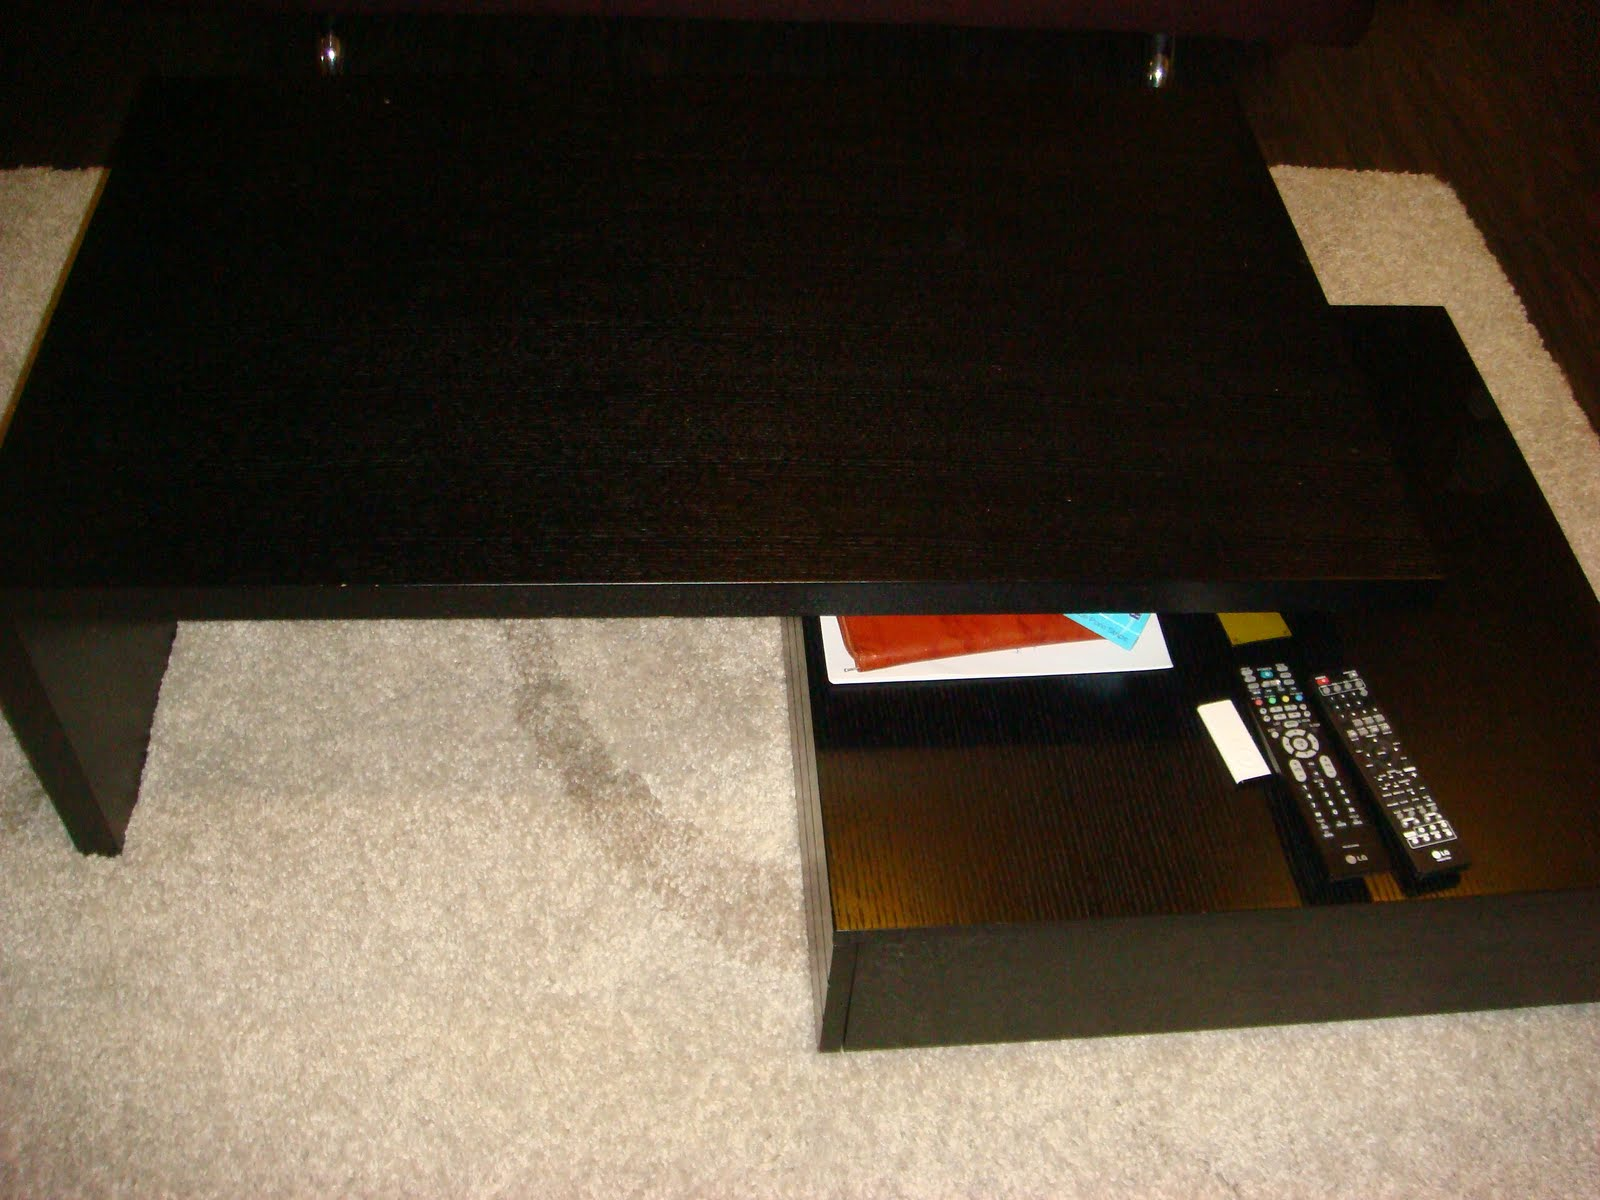 Moving Sale - Furniture at Half Price